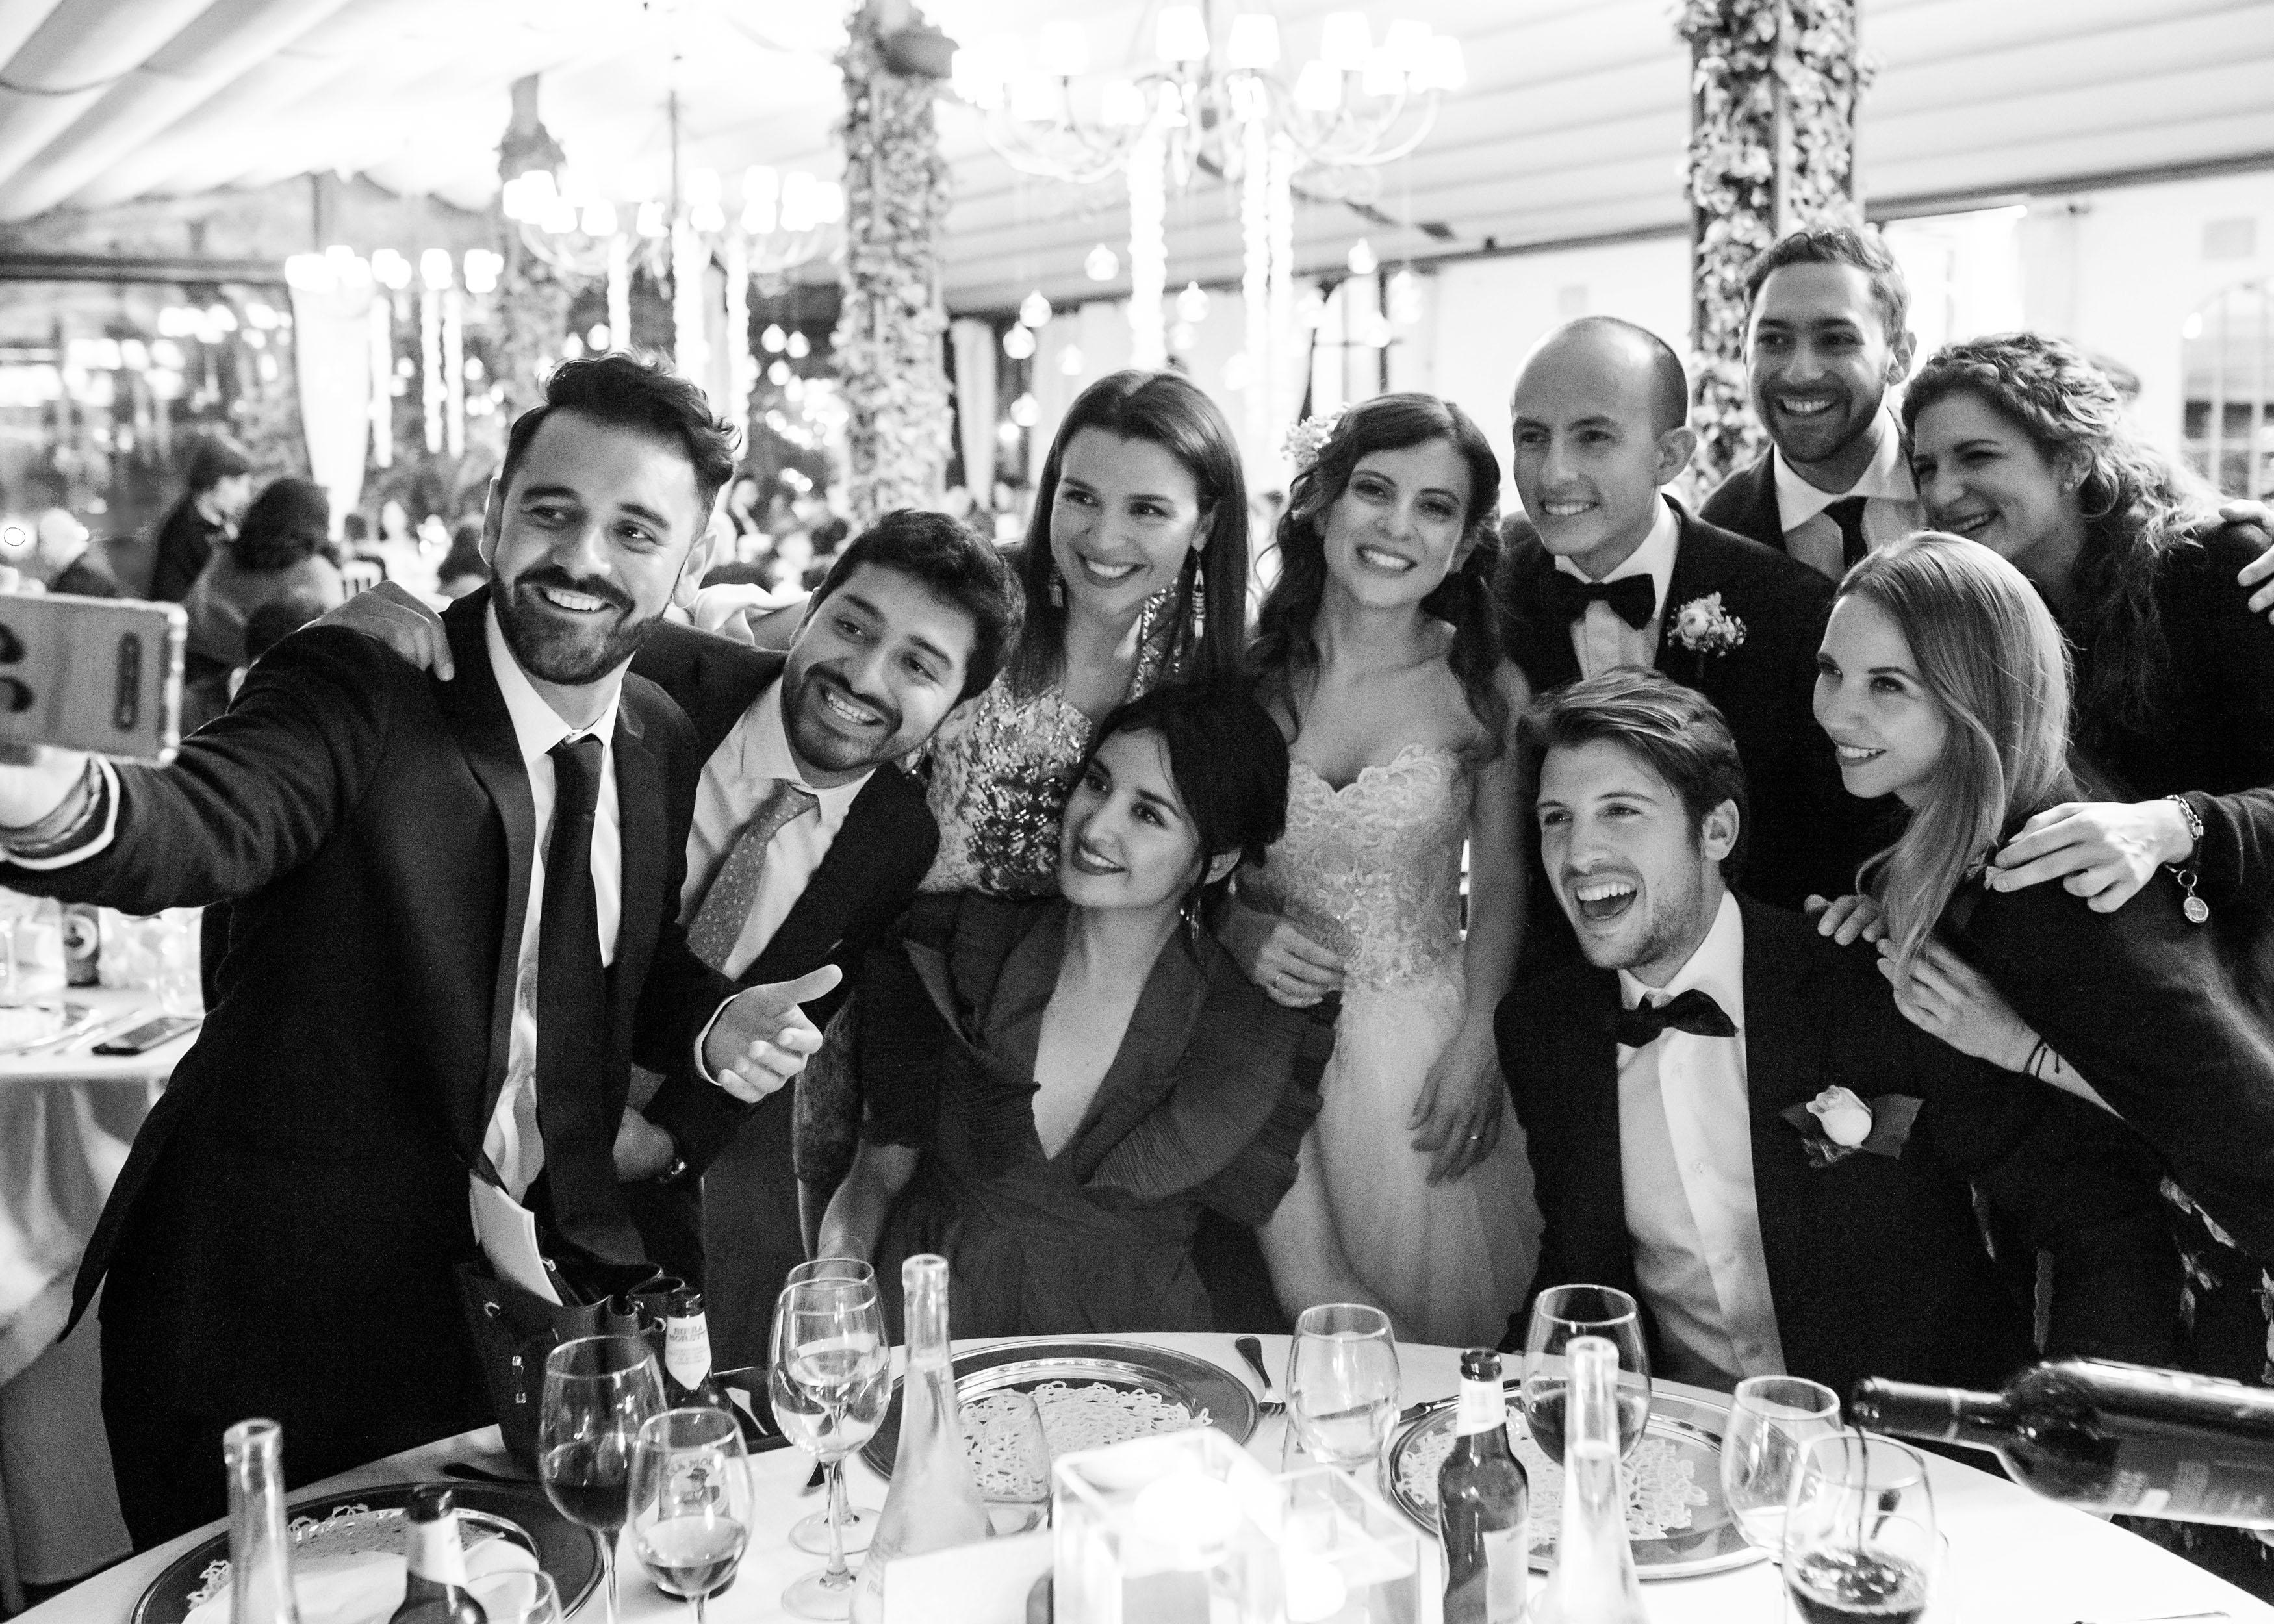 https://www.weddingamalfi.com/wp-content/uploads/Katia-Jorge-18-maggio-2019-44.jpg